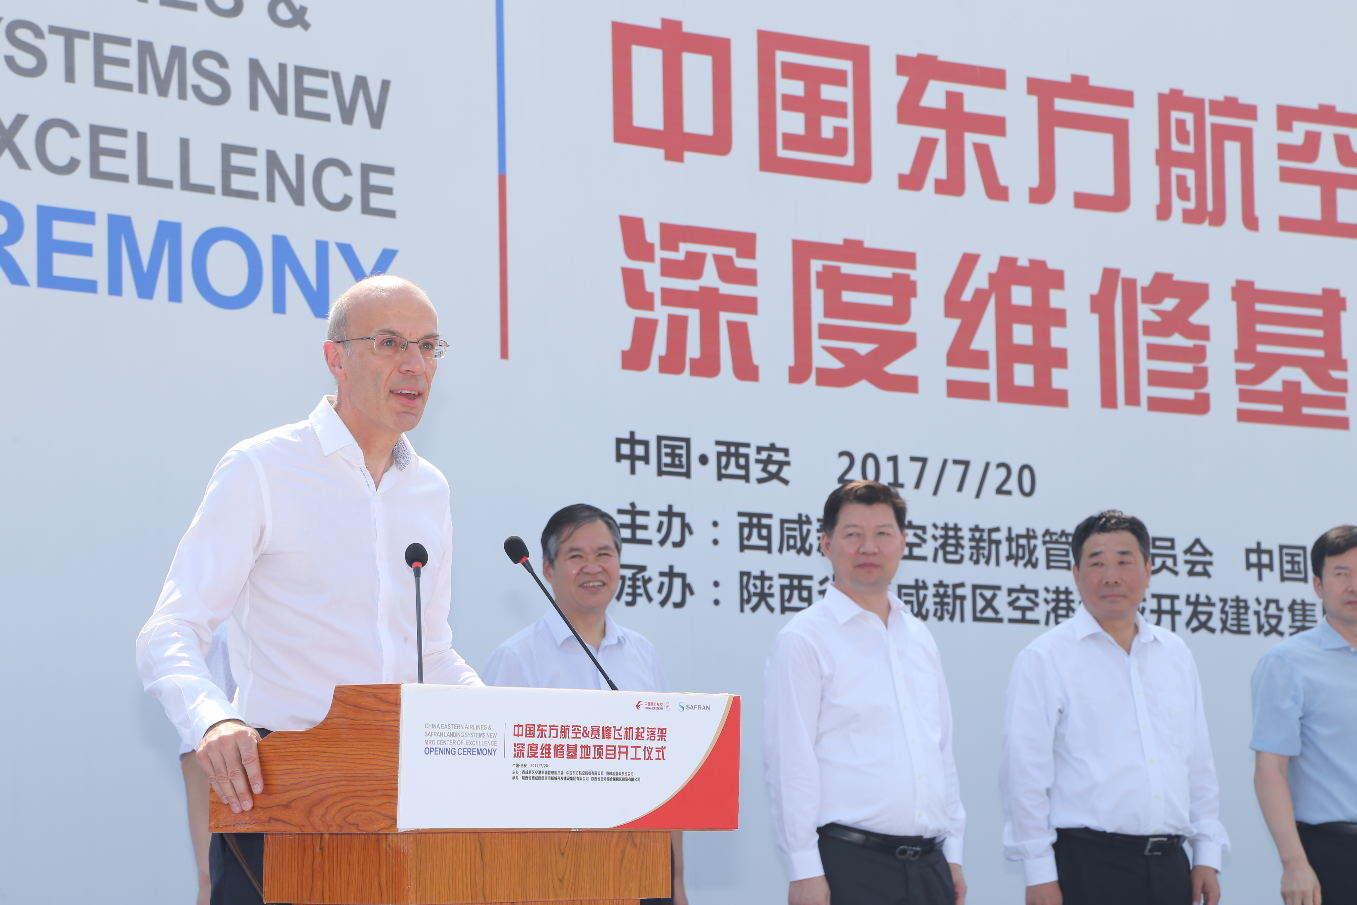 Safran, China Eastern start work on Xi'an landing gear MRO plant